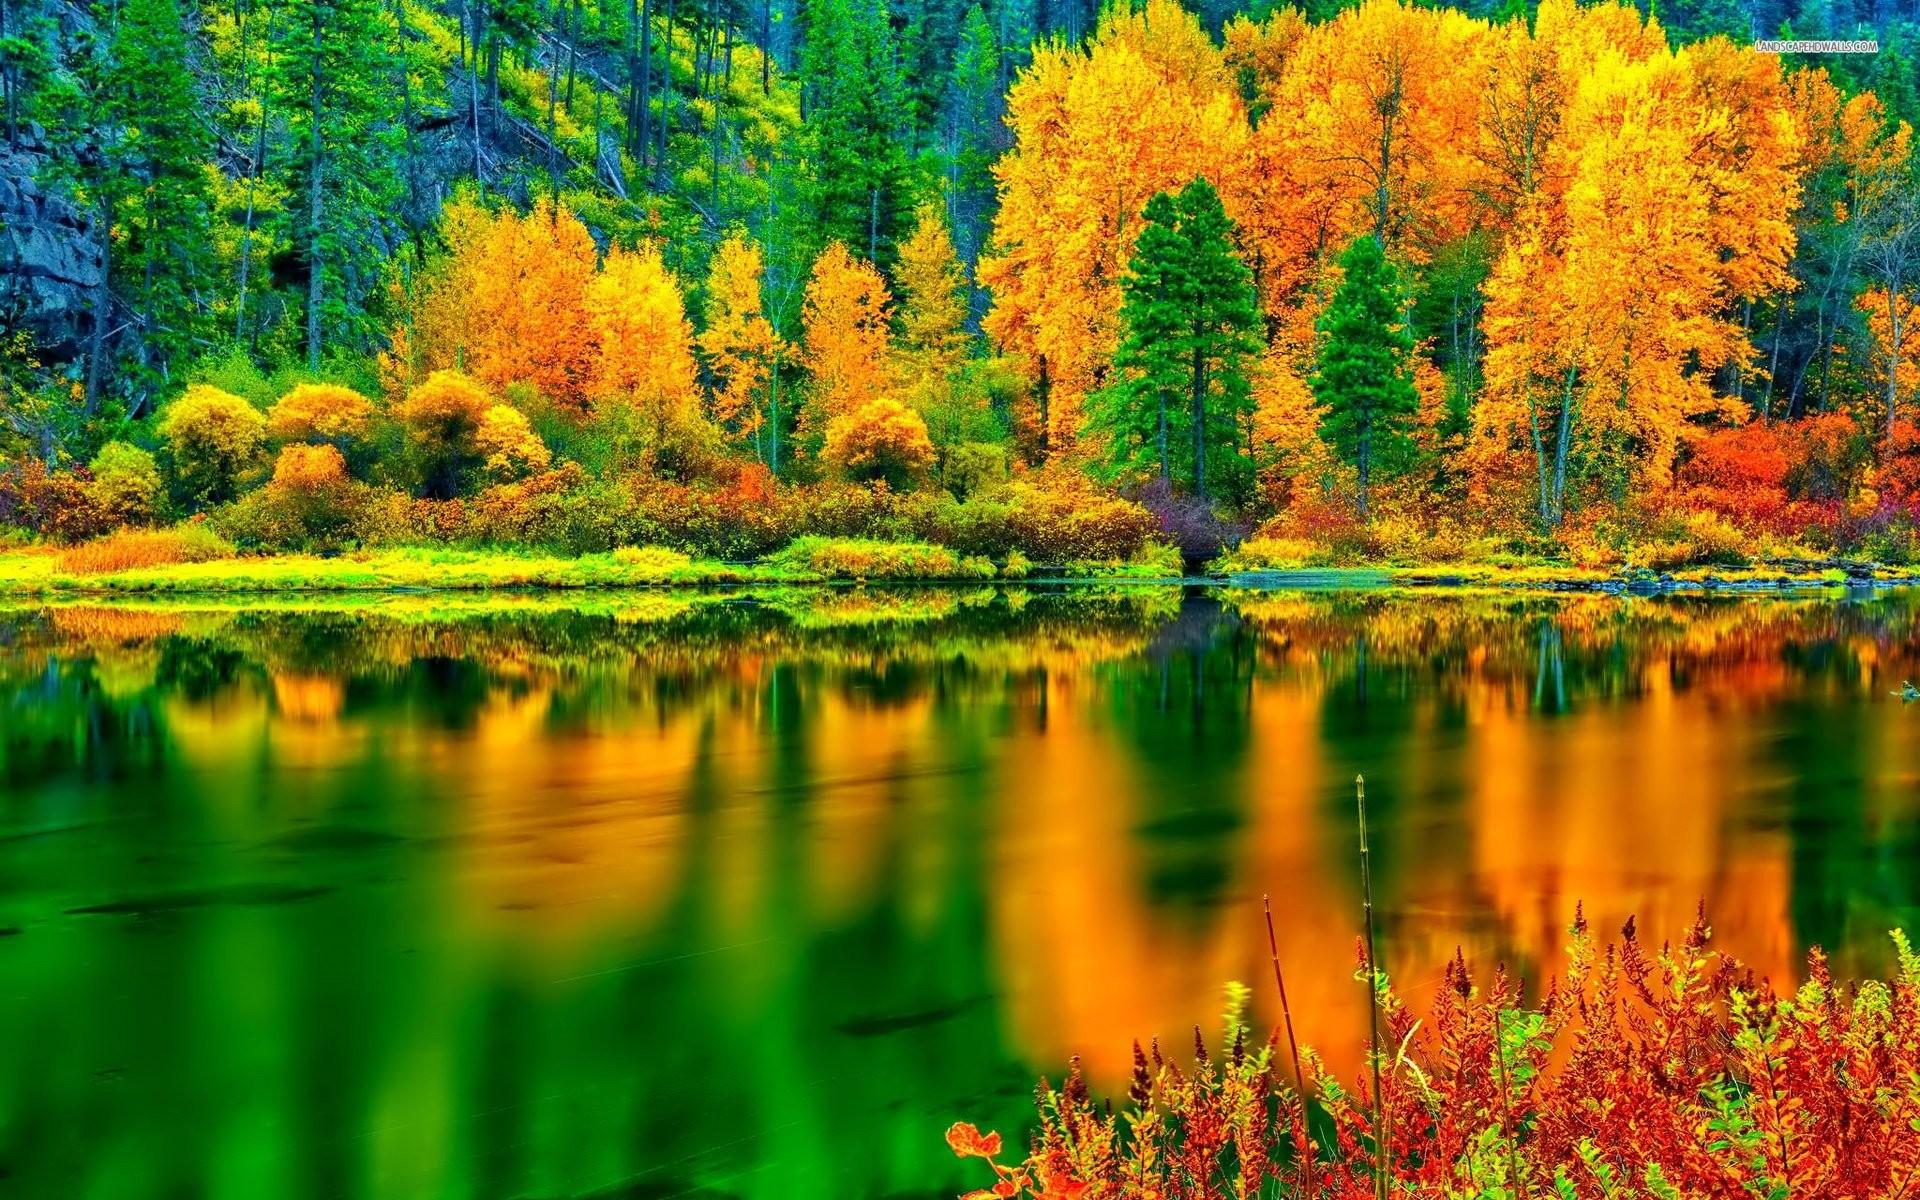 Orange Amd Green Autumn In The Forest